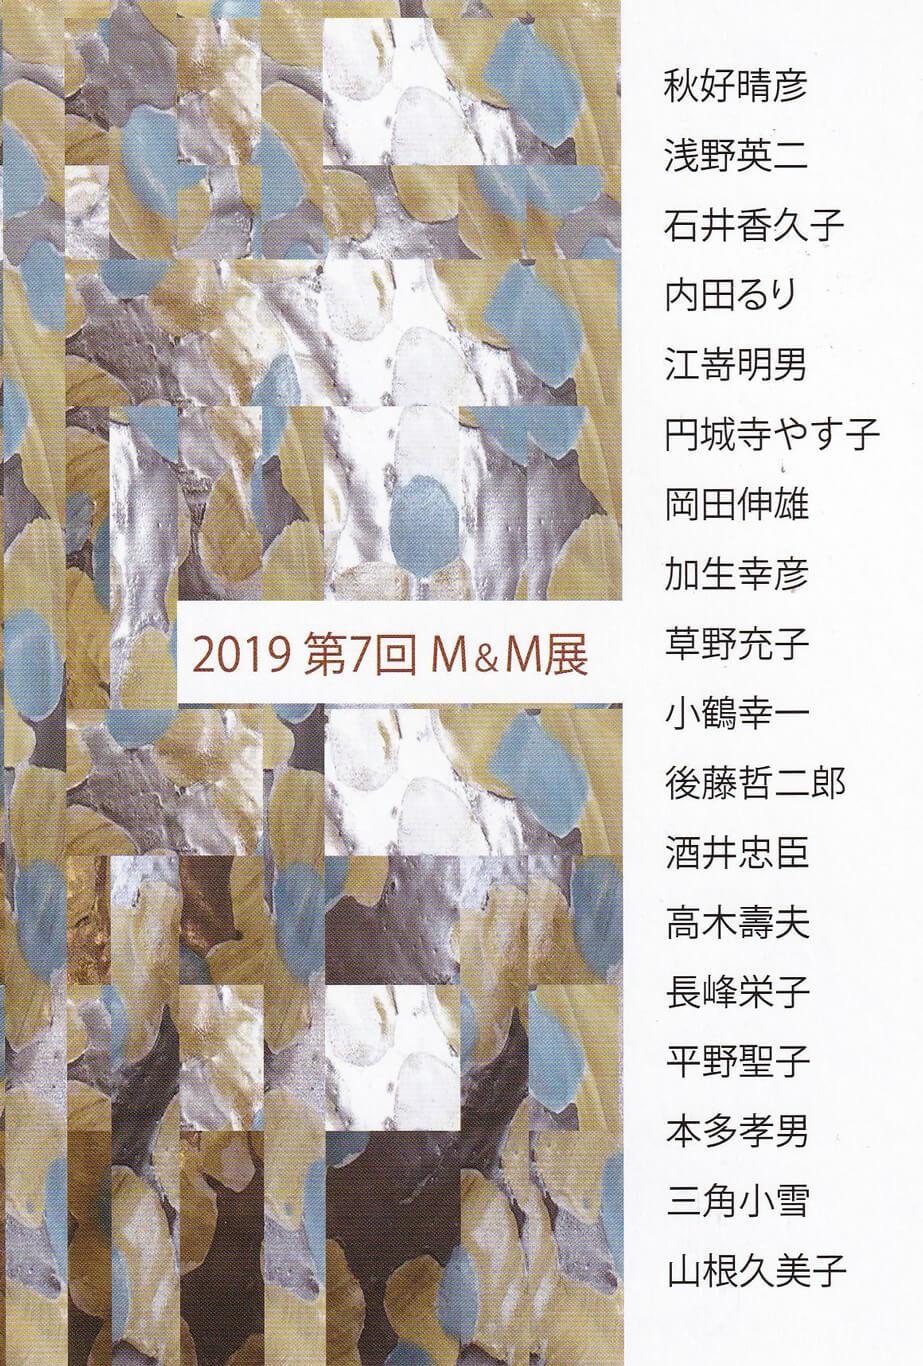 toile-201911-M&M展